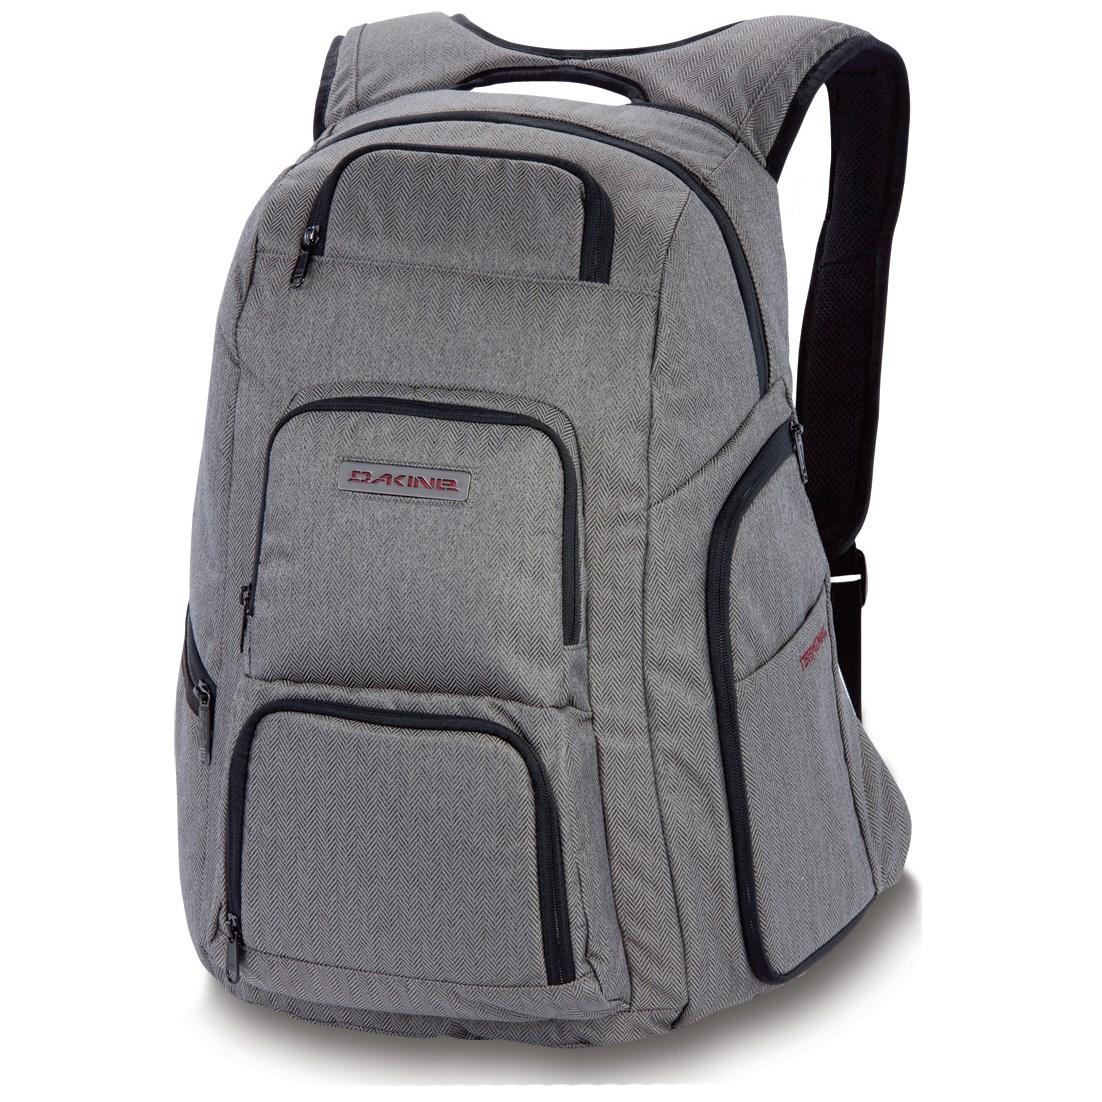 DaKine Terminal Backpack | evo outlet